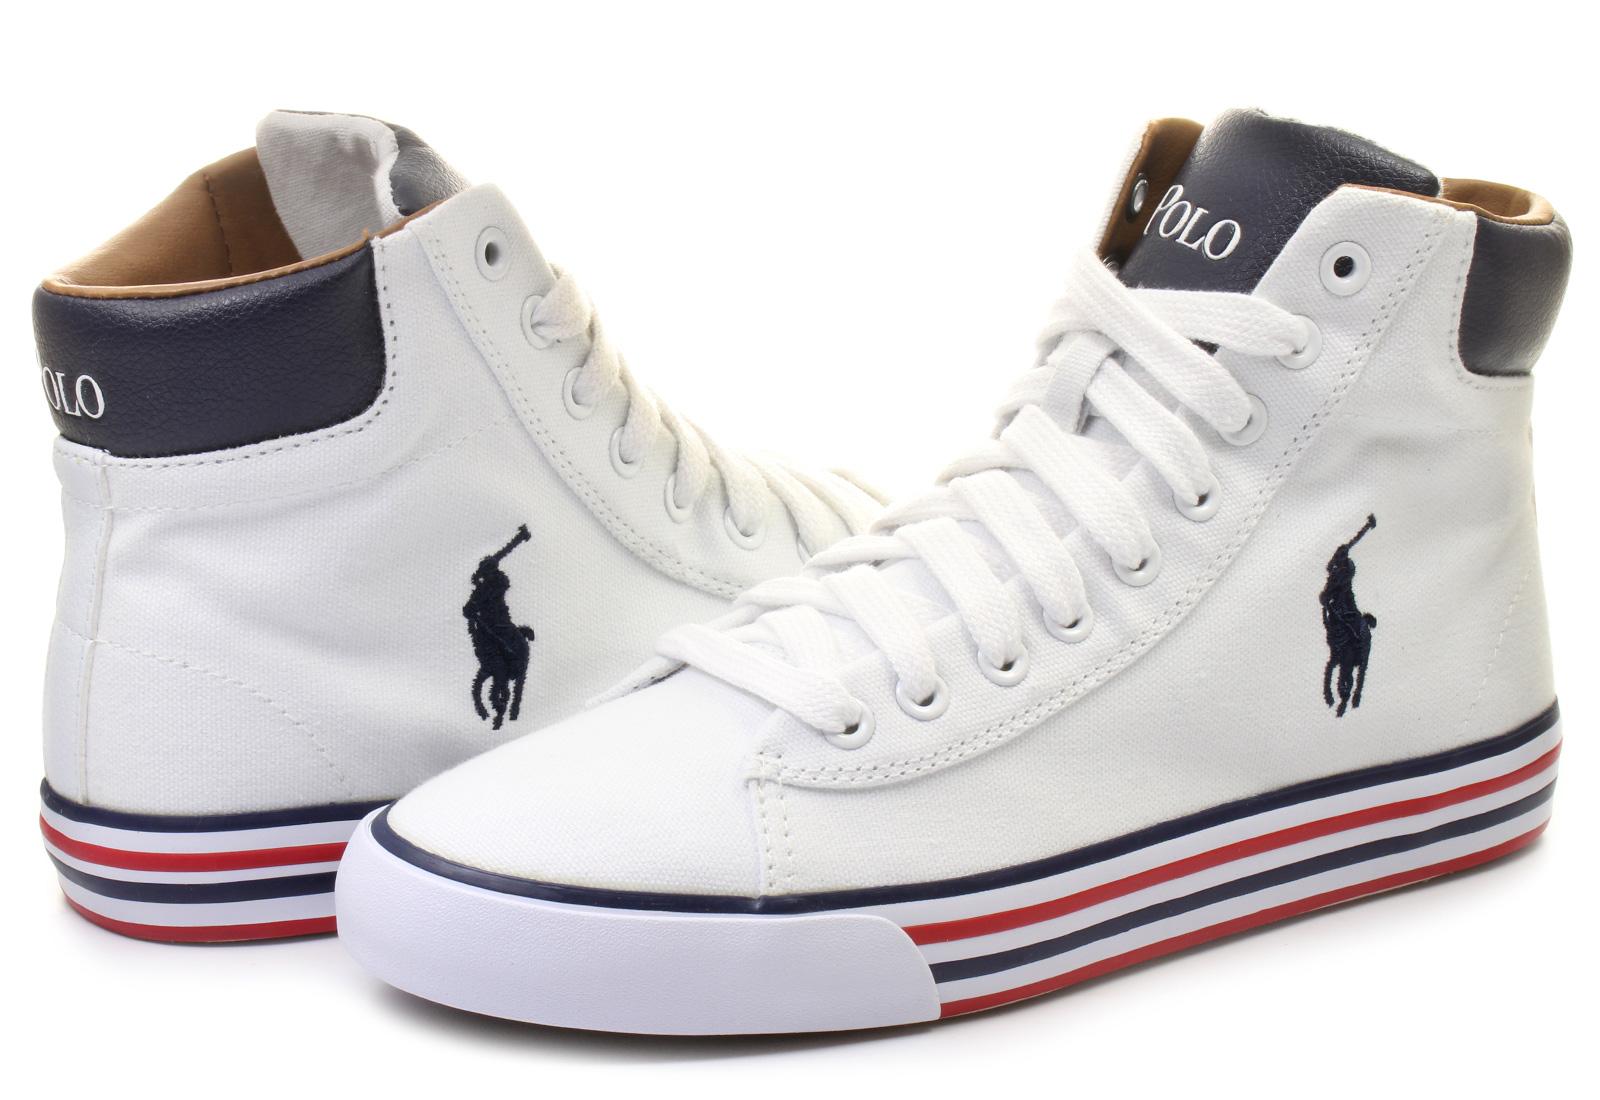 POLO Ralph Lauren Textil Sneaker HARVEY MID Textil weiß